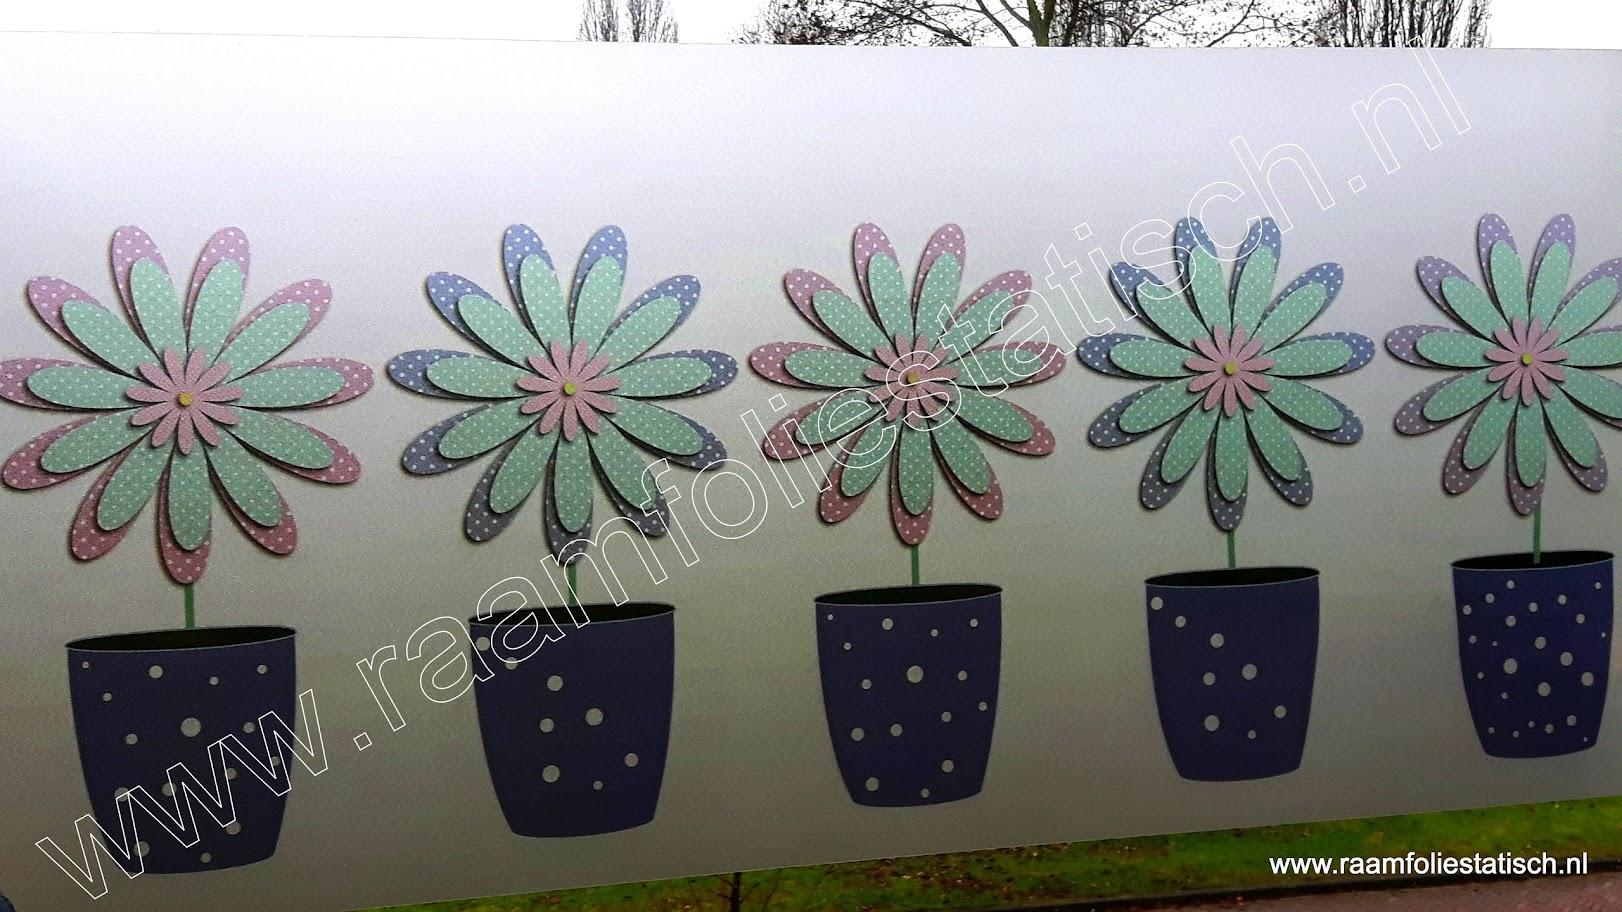 Raamfolie statisch modern flowers bestellen?